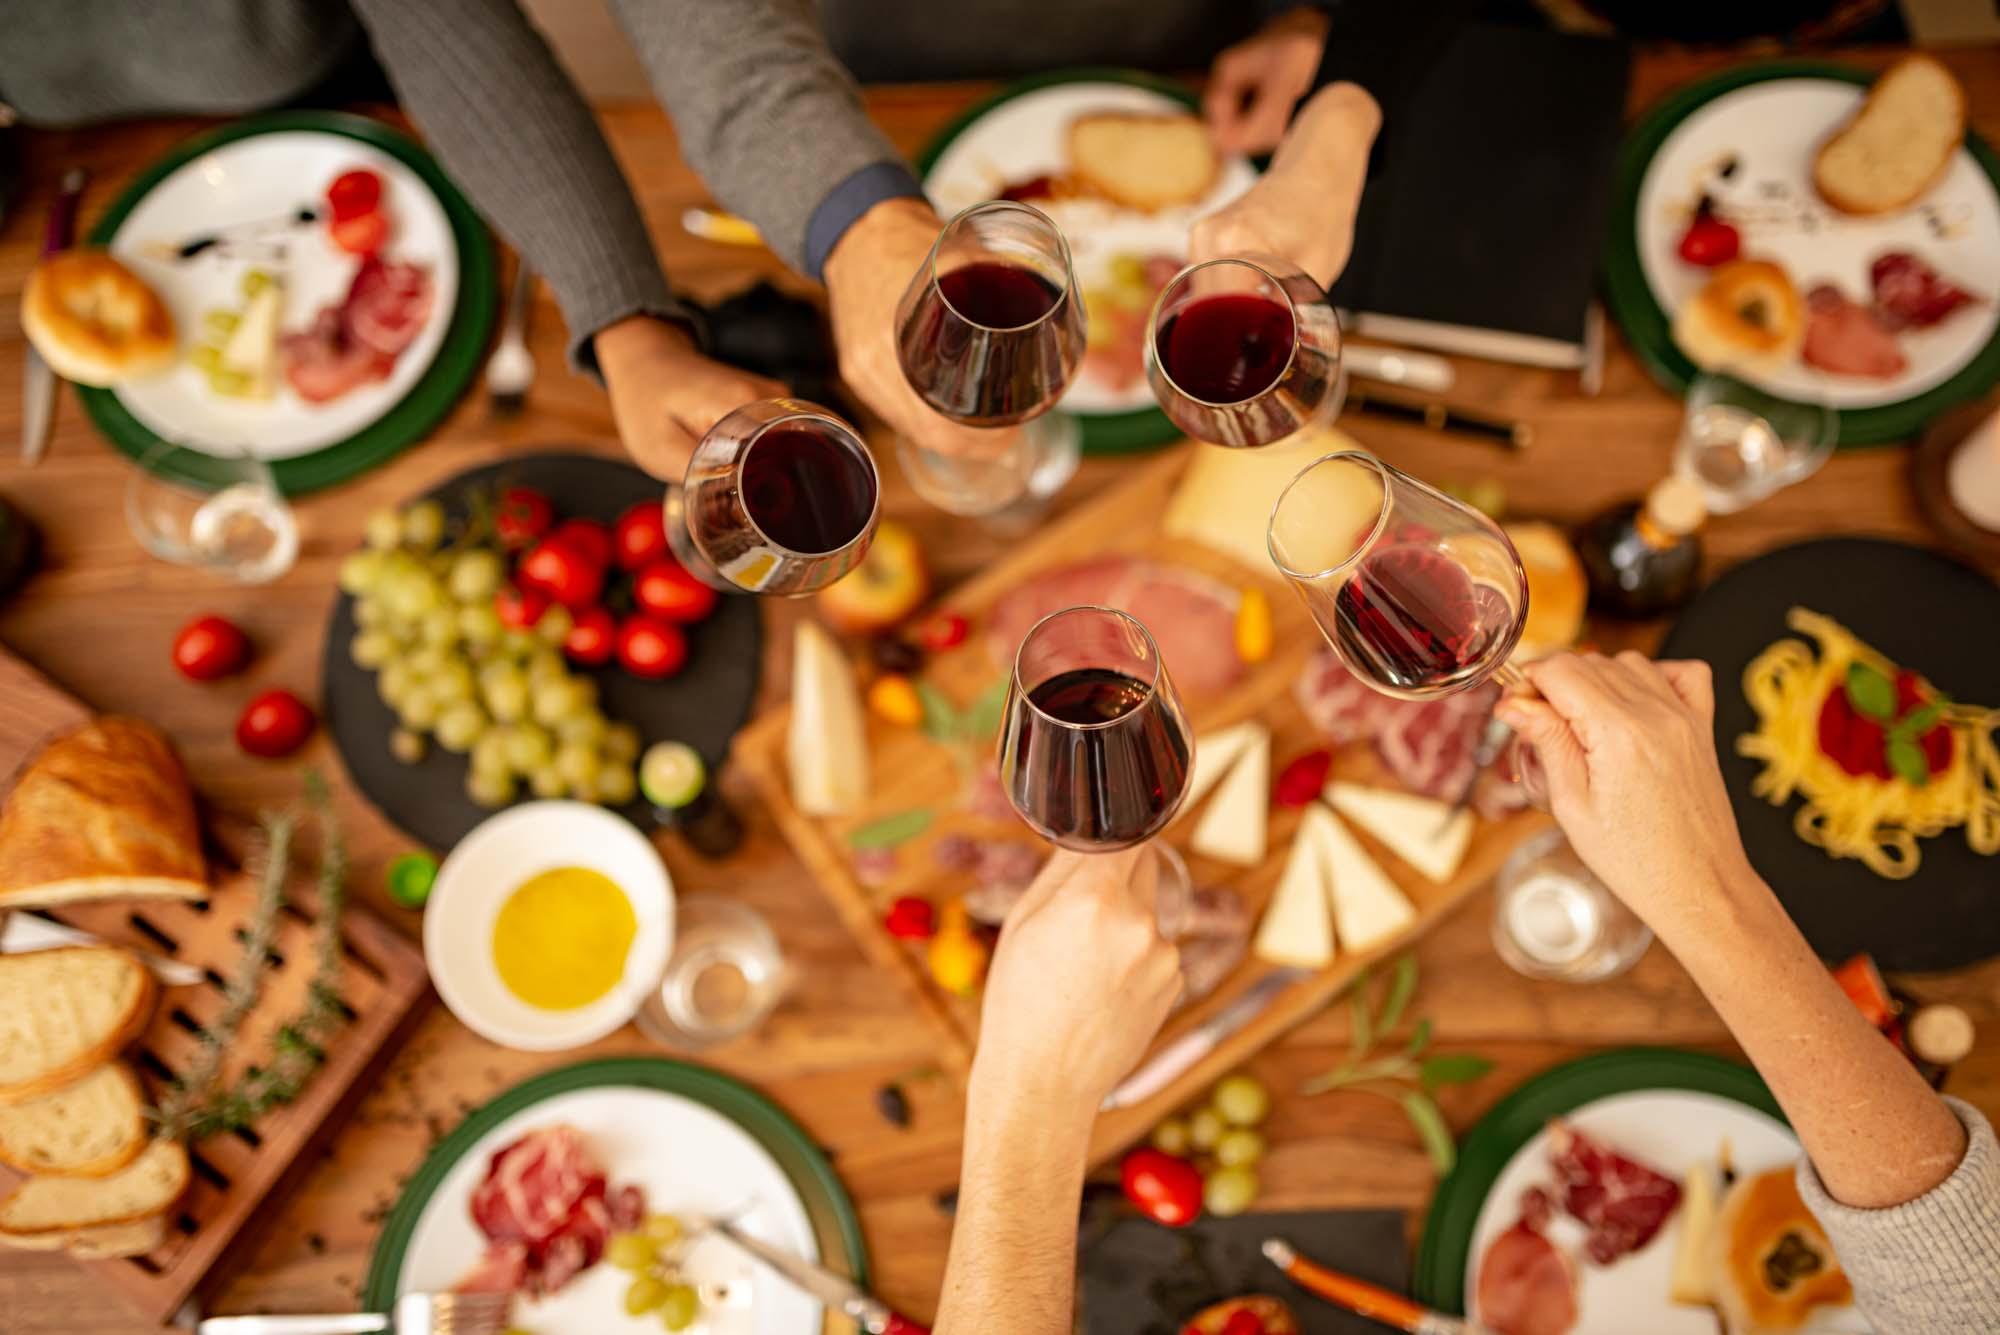 Corsi Di Cucina Cene Aziendali a Catania